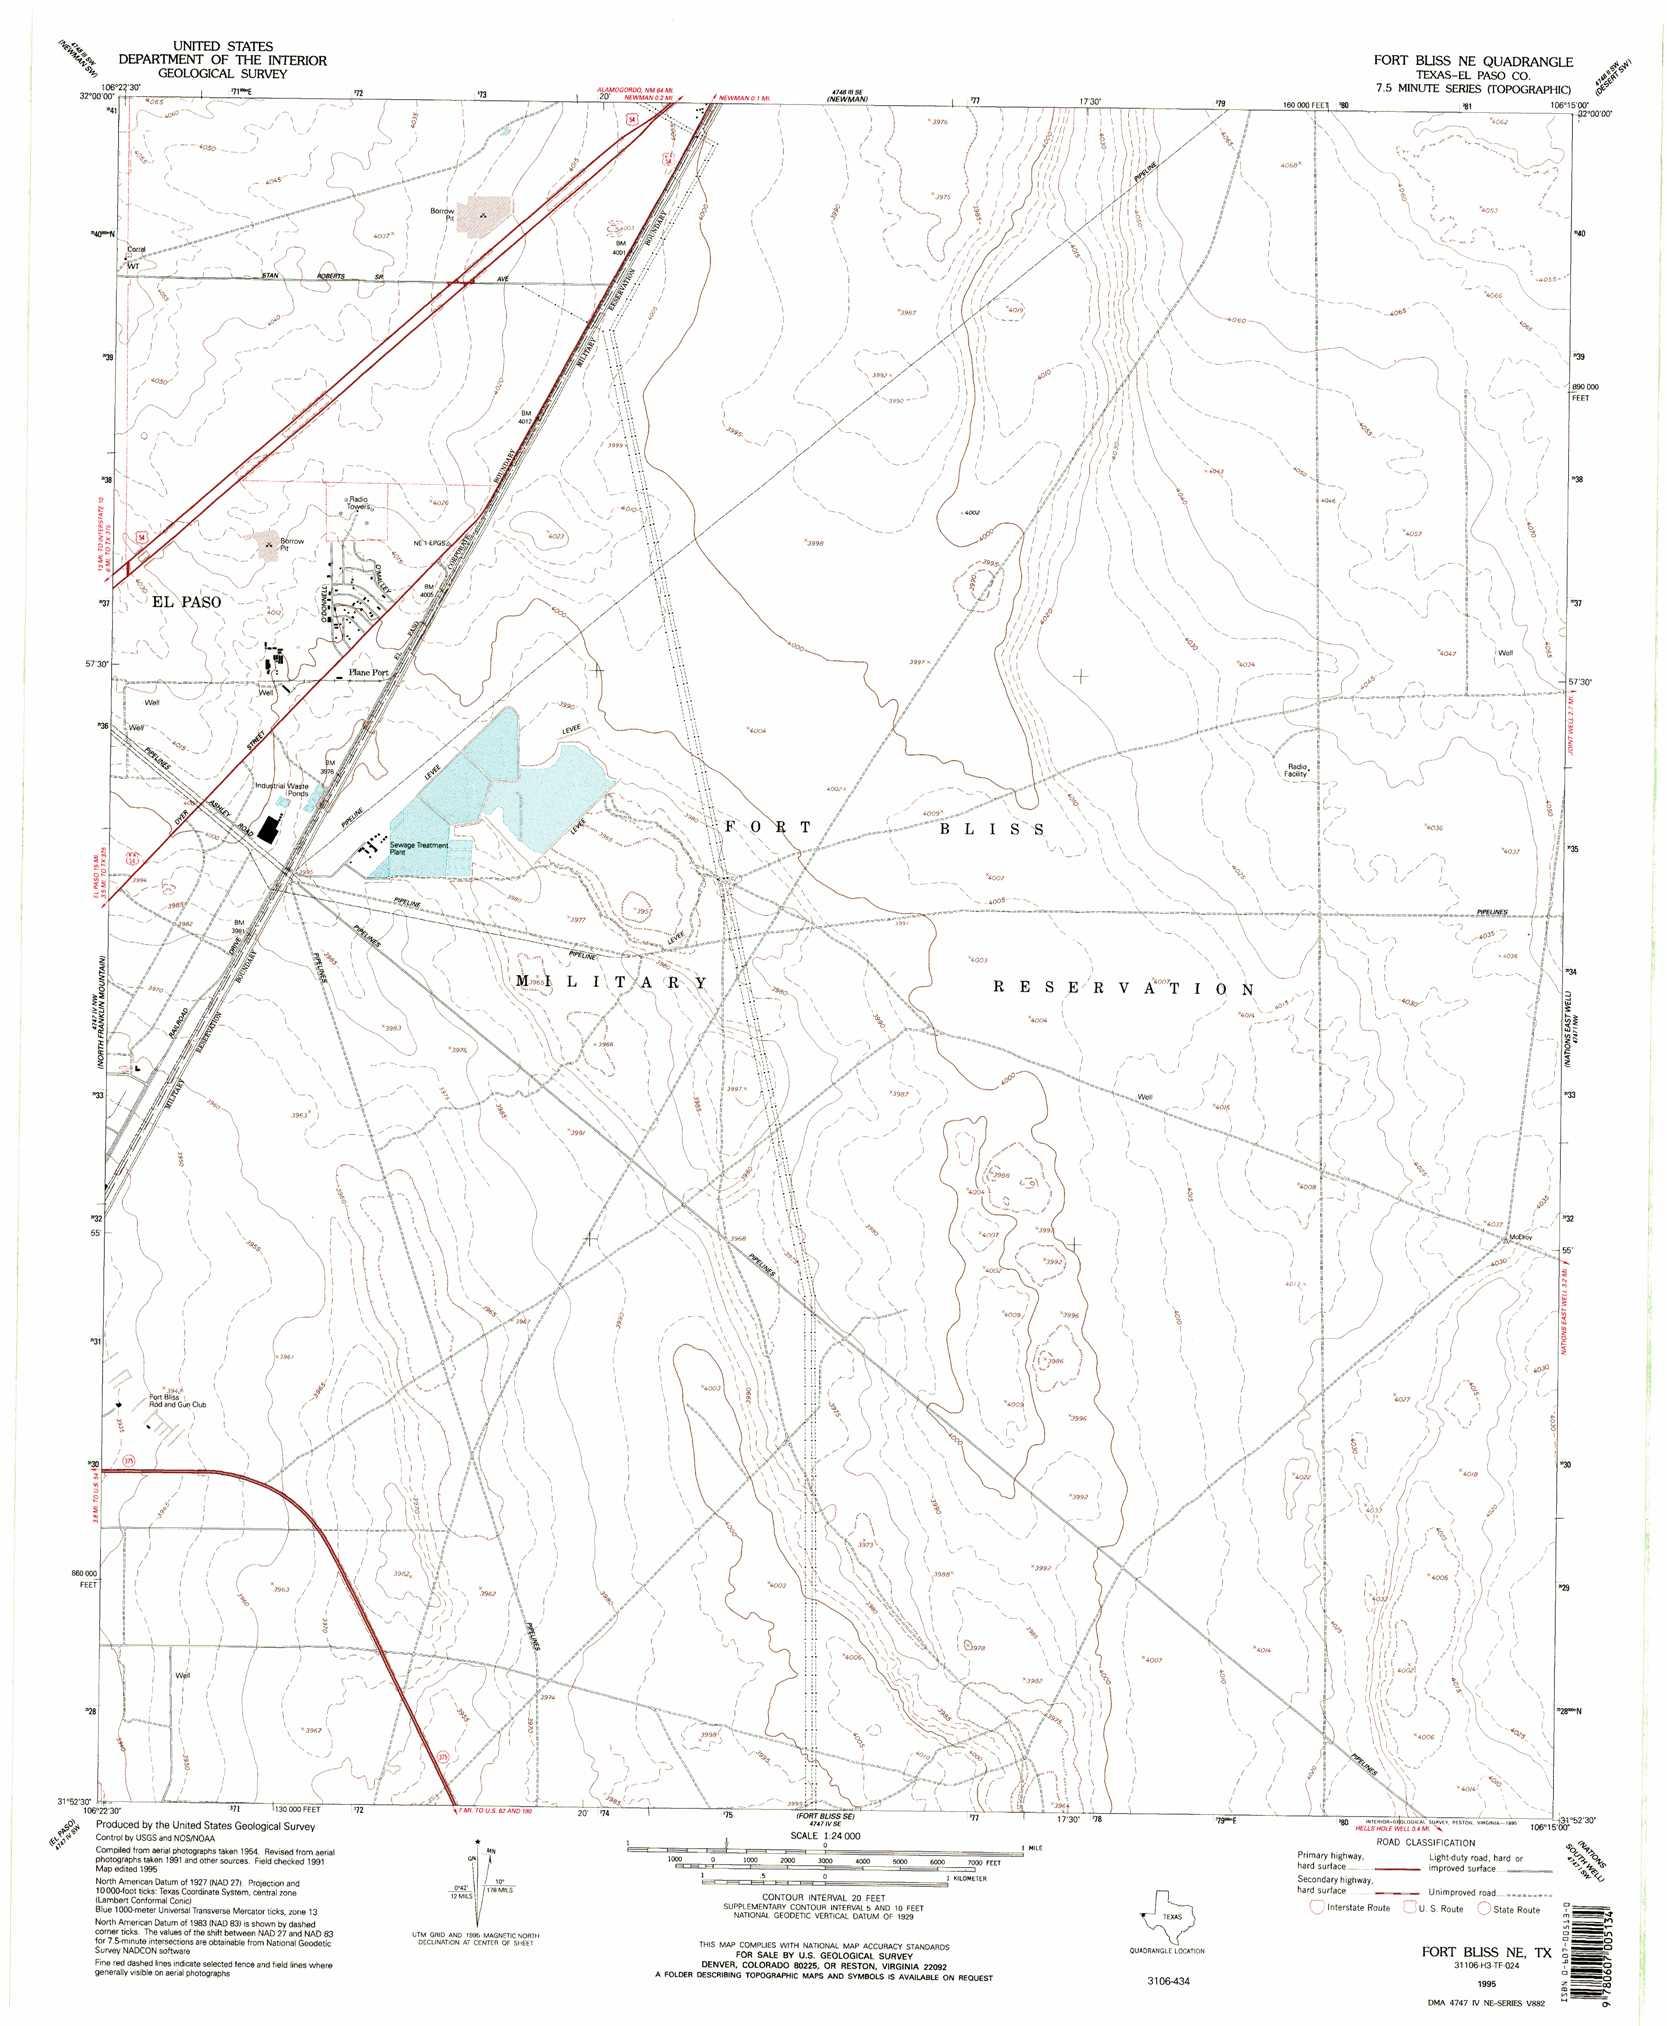 Fort Bliss Ne Topographic Map TX  USGS Topo Quad 31106h3